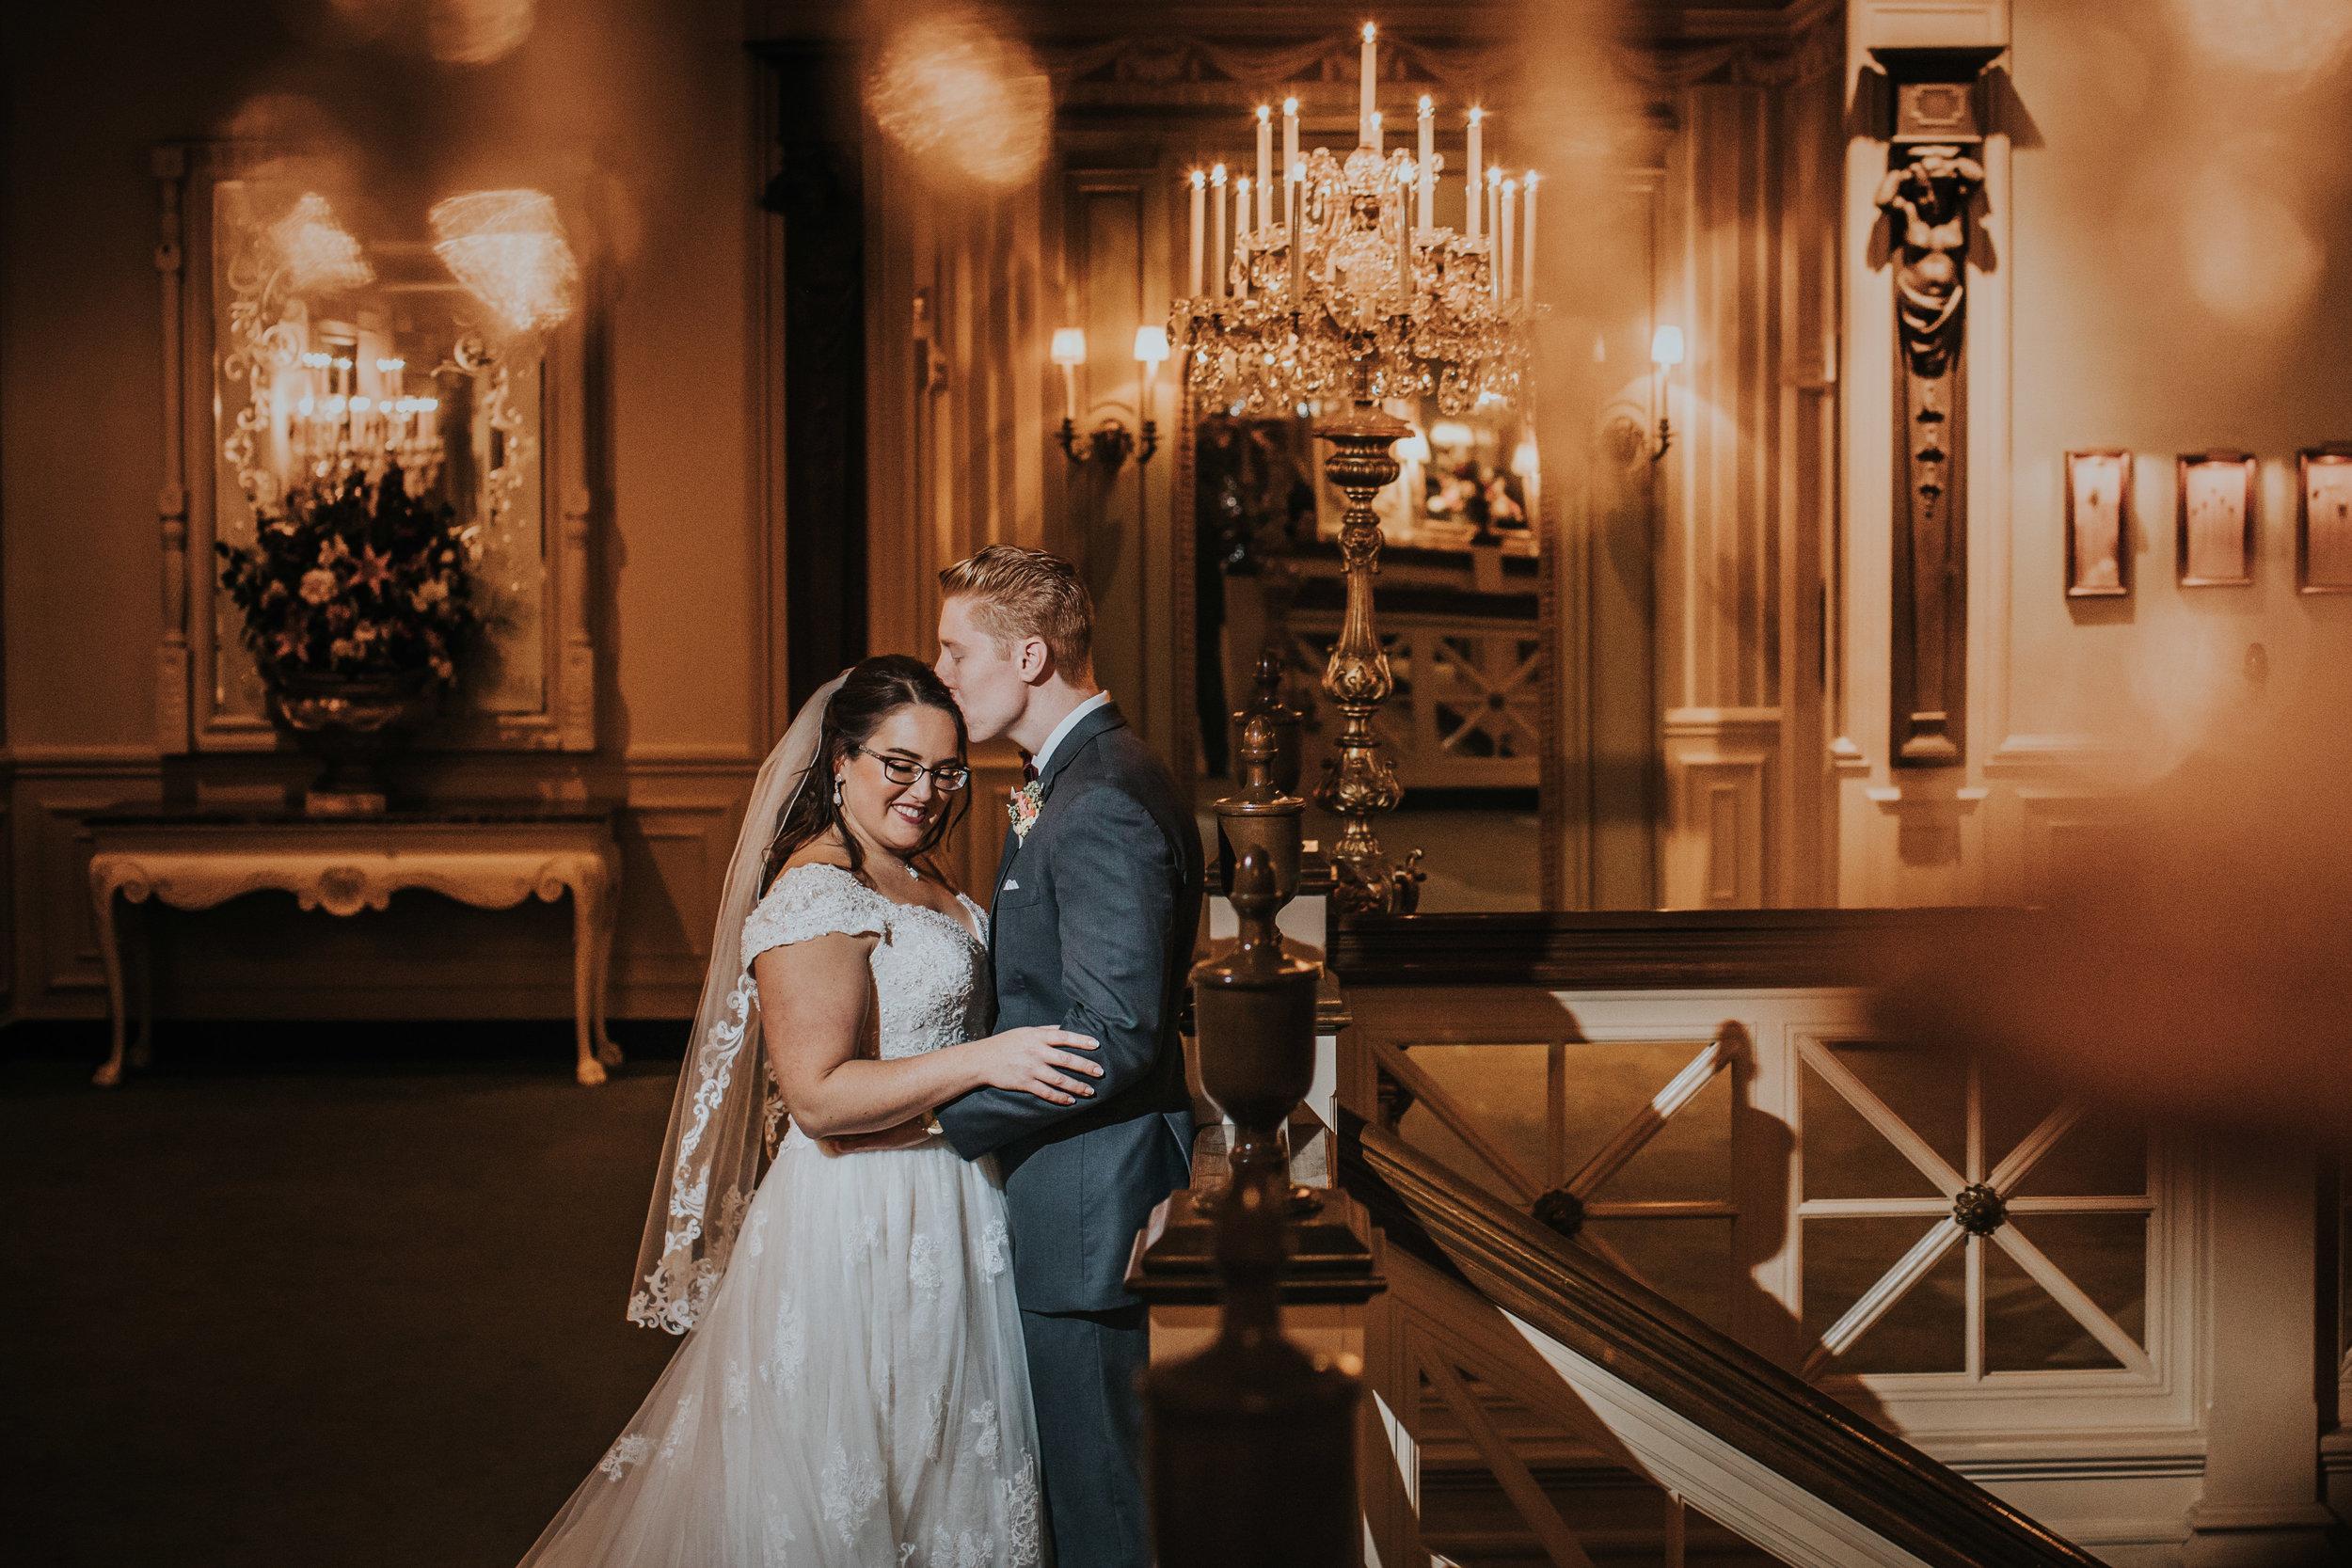 New-Jersey-Wedding-Photography-Fishers-Tudor-House-JennaLynnPhotography-Bride&Groom-Kathleen&Eddie-21.jpg